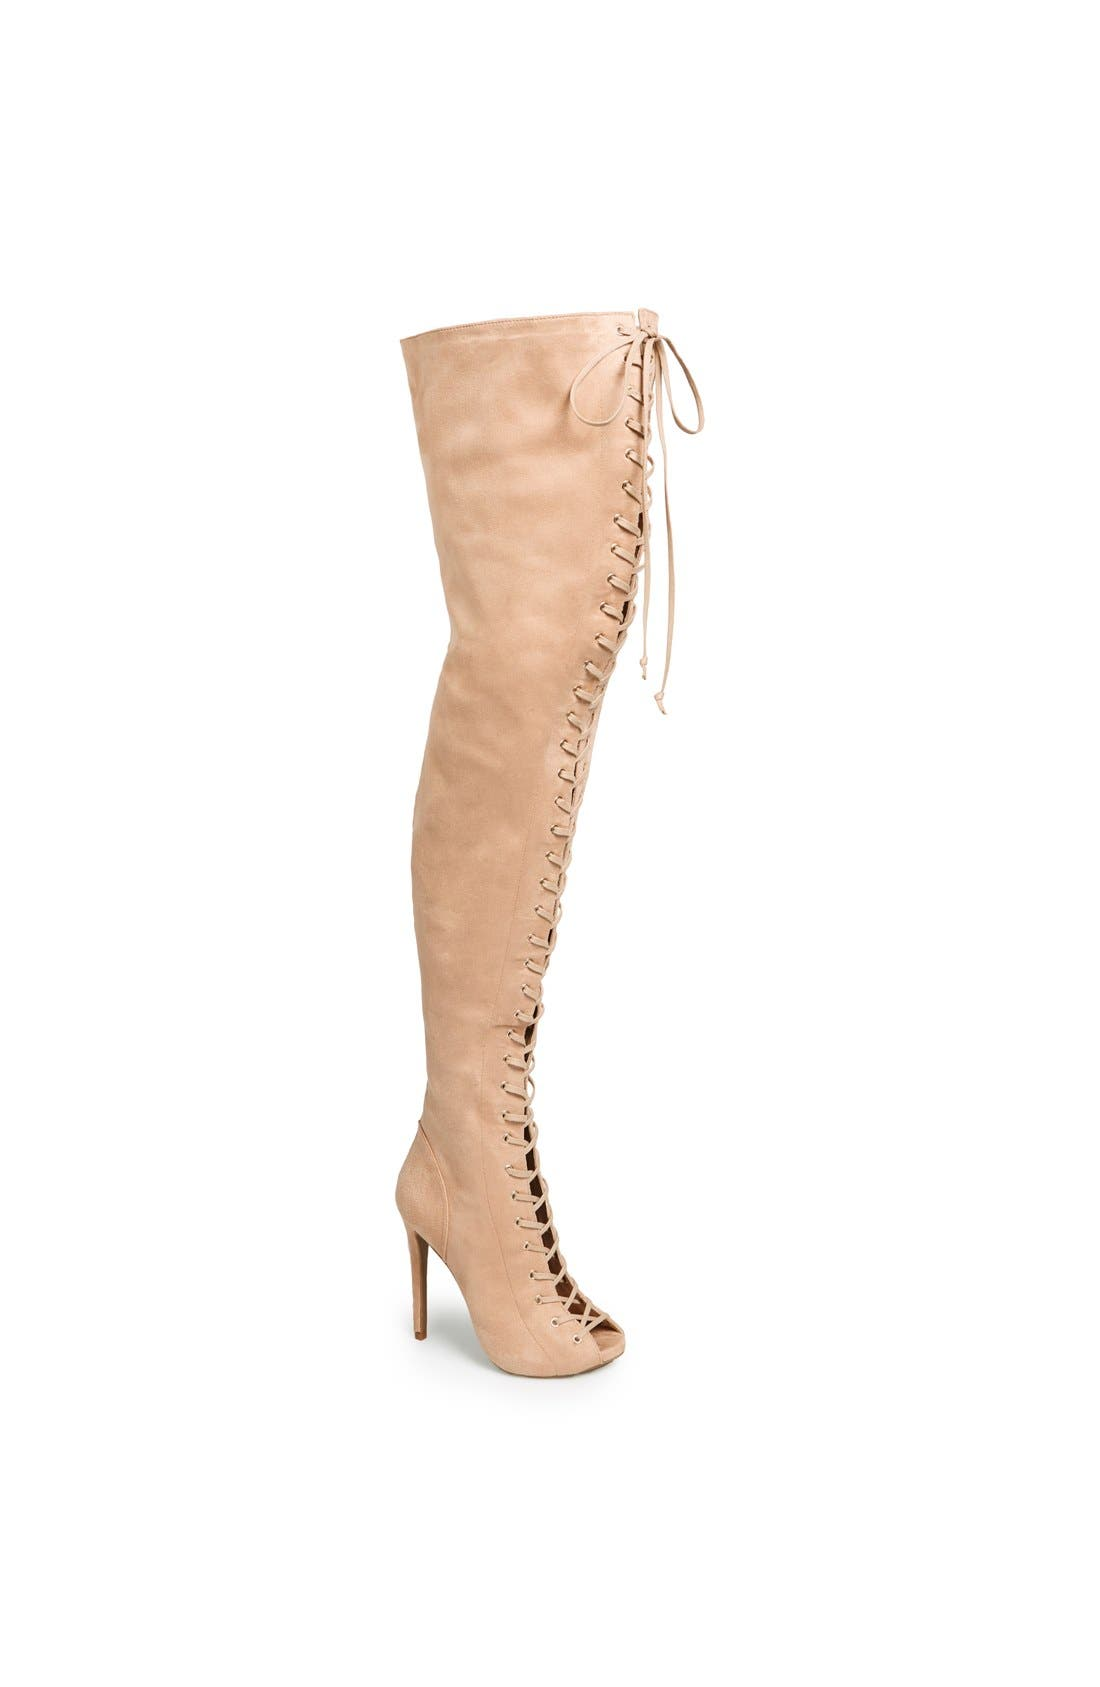 Alternate Image 1 Selected - ZiGi girl 'Piarry' Lace-Up Thigh-High Boot (Narrow Calf)